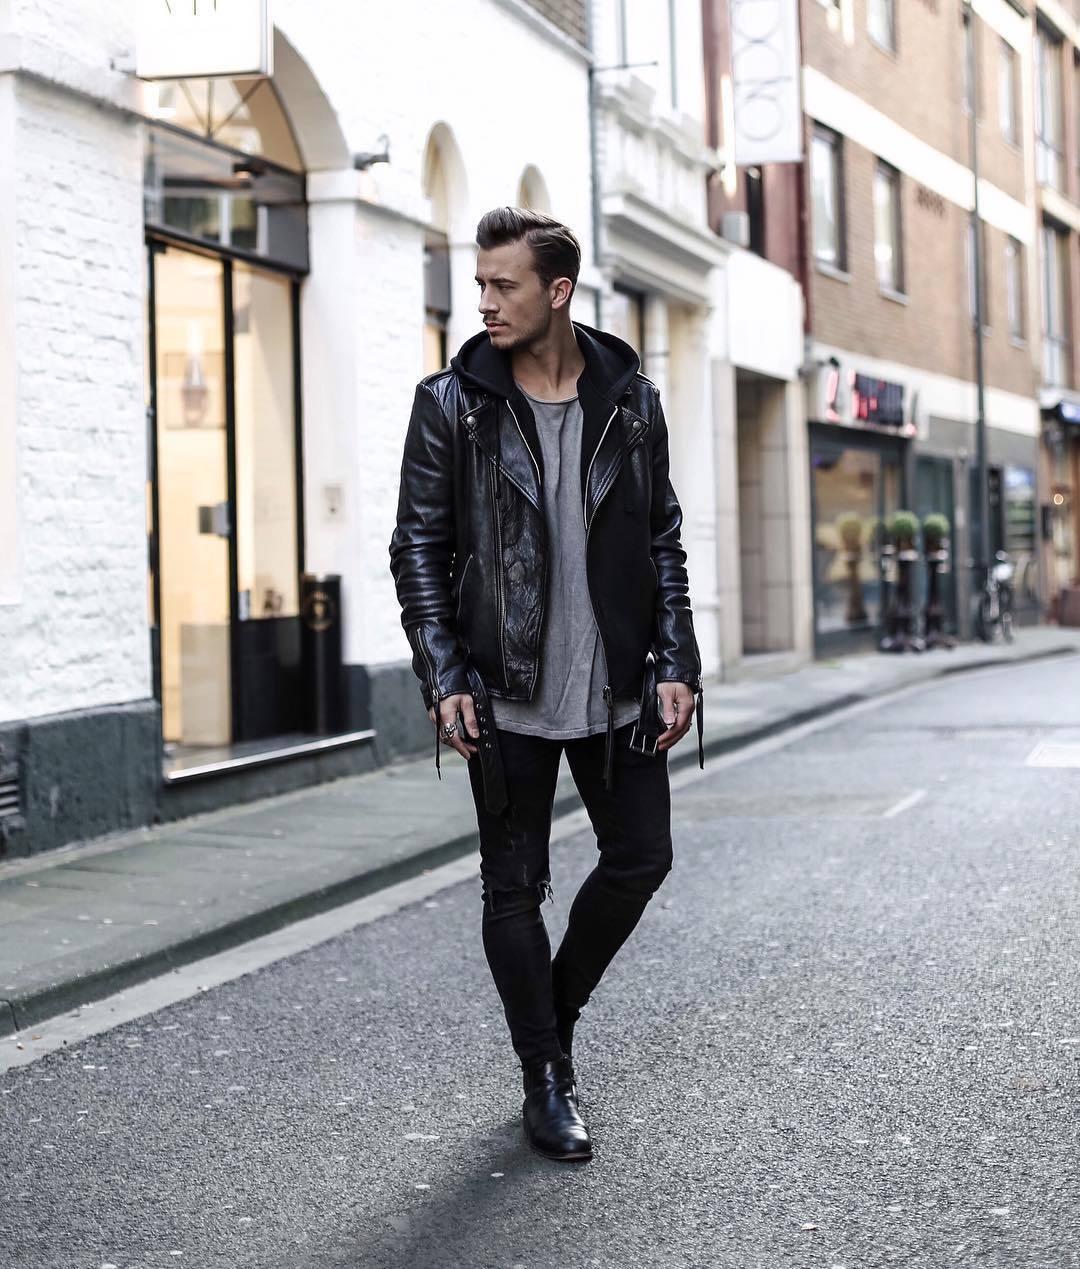 6f13265b Men's Black Leather Biker Jacket, Grey Crew-neck T-shirt, Black ...